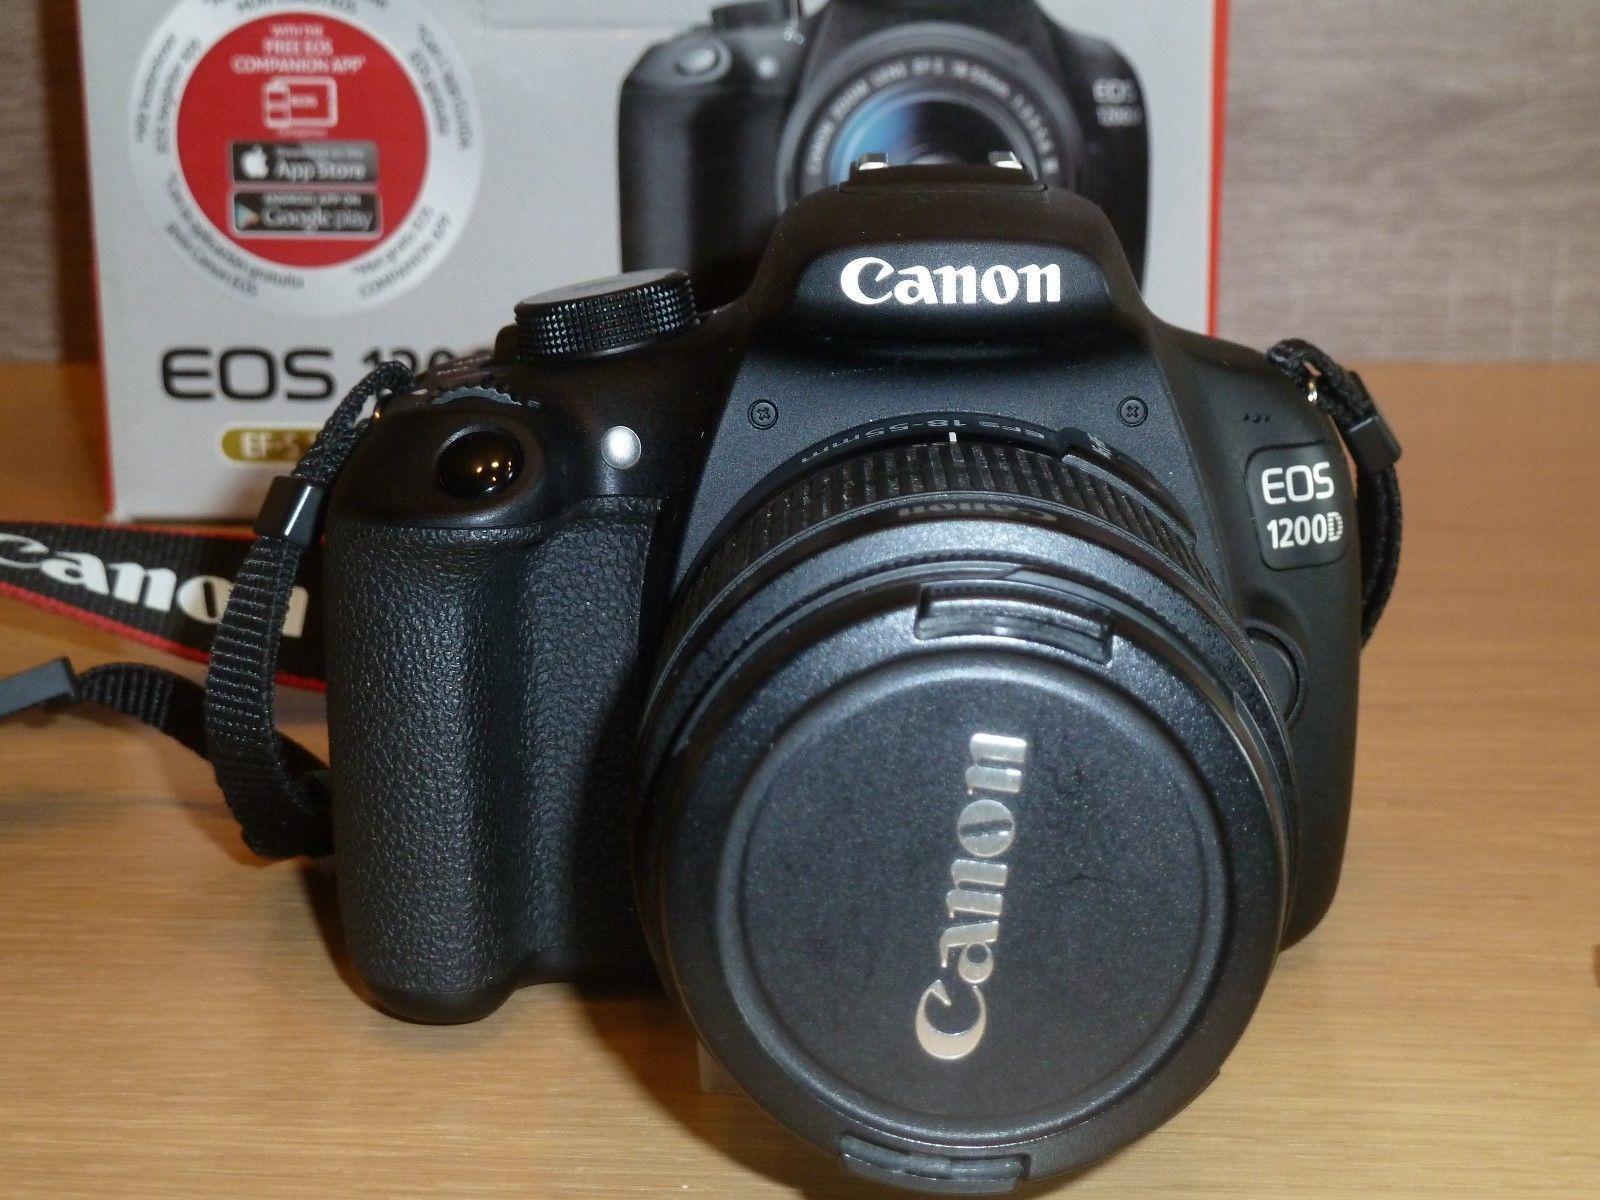 Kelebihan New Camera Dslr Canon 1200d Kit 18 55mm Terkini Daftar Eos Iii Non Is